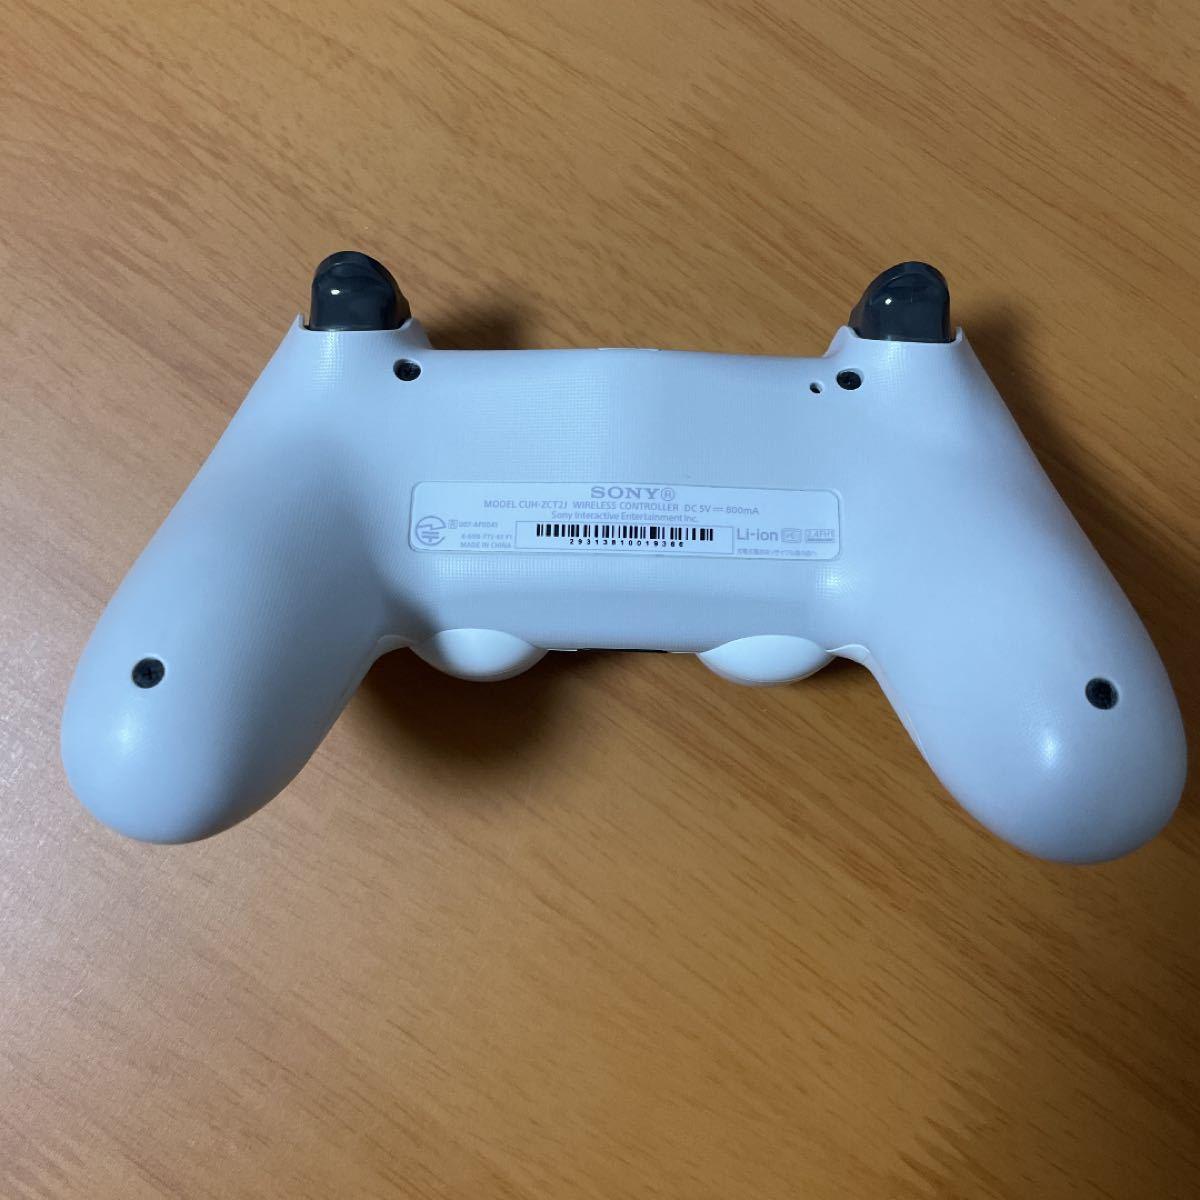 【PS4】 PlayStation4 本体 CUH-2200A  500GB ホワイト DualShock4